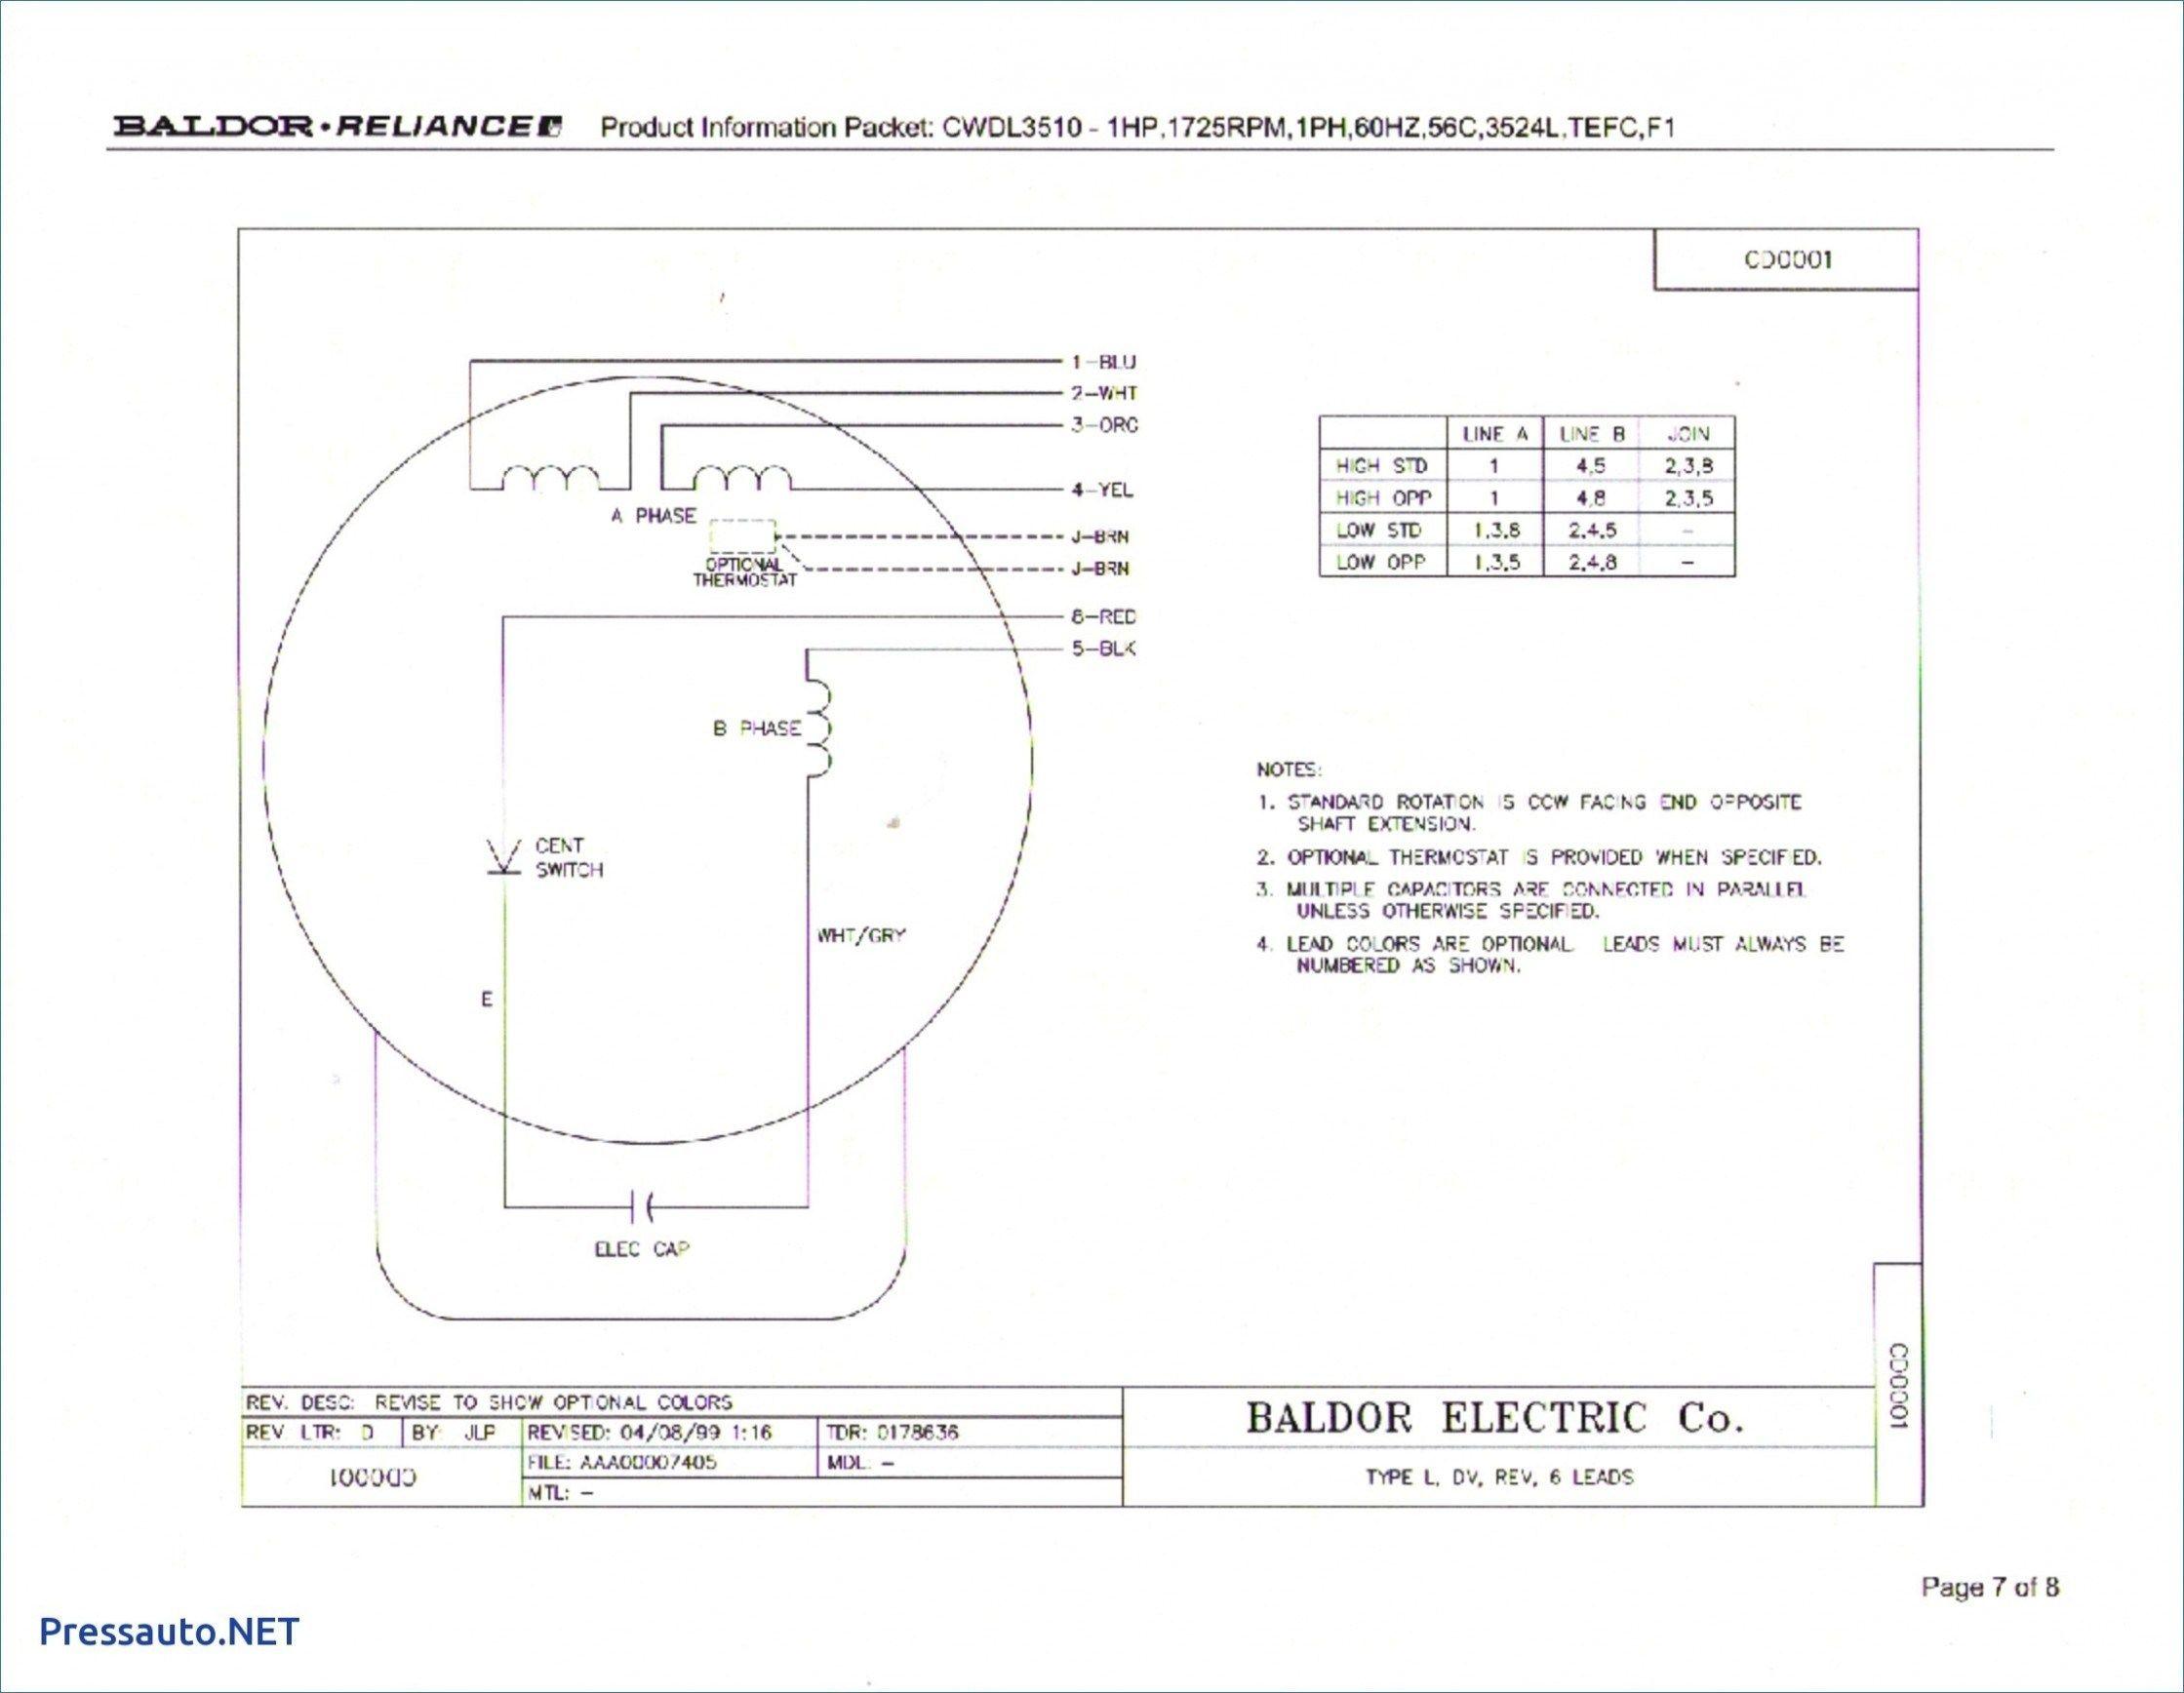 16 Stunning Wiring Diagram For 220 Volt Single Phase Motor References Https Bacamajalah Com 16 Stunning Wi Electrical Circuit Diagram Diagram Diagram Chart